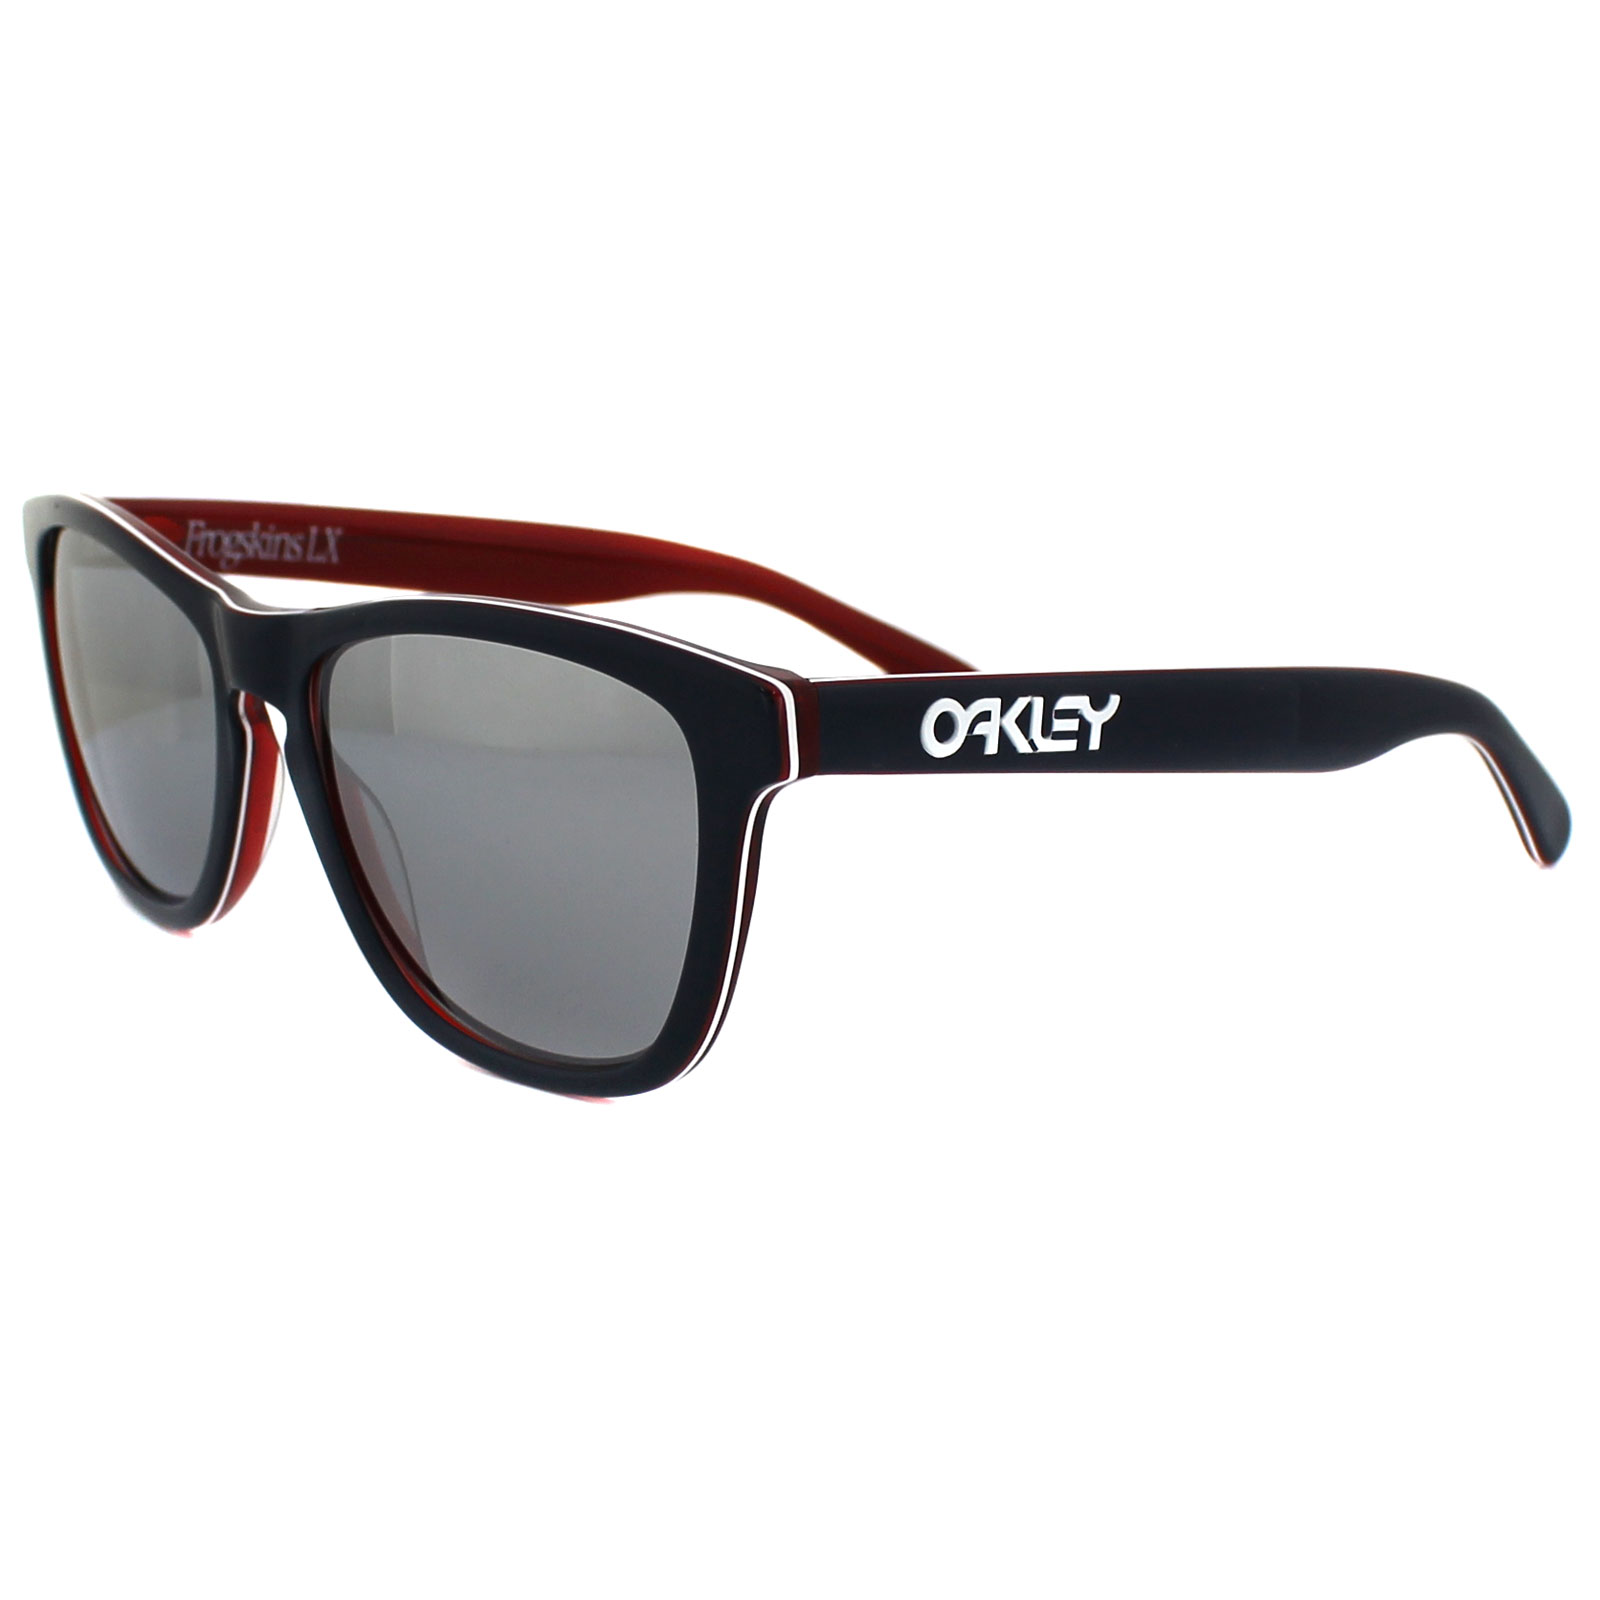 c20f6a85ad Sentinel Oakley Sunglasses Frogskins LX OO2043-05 Navy Chrome Iridium